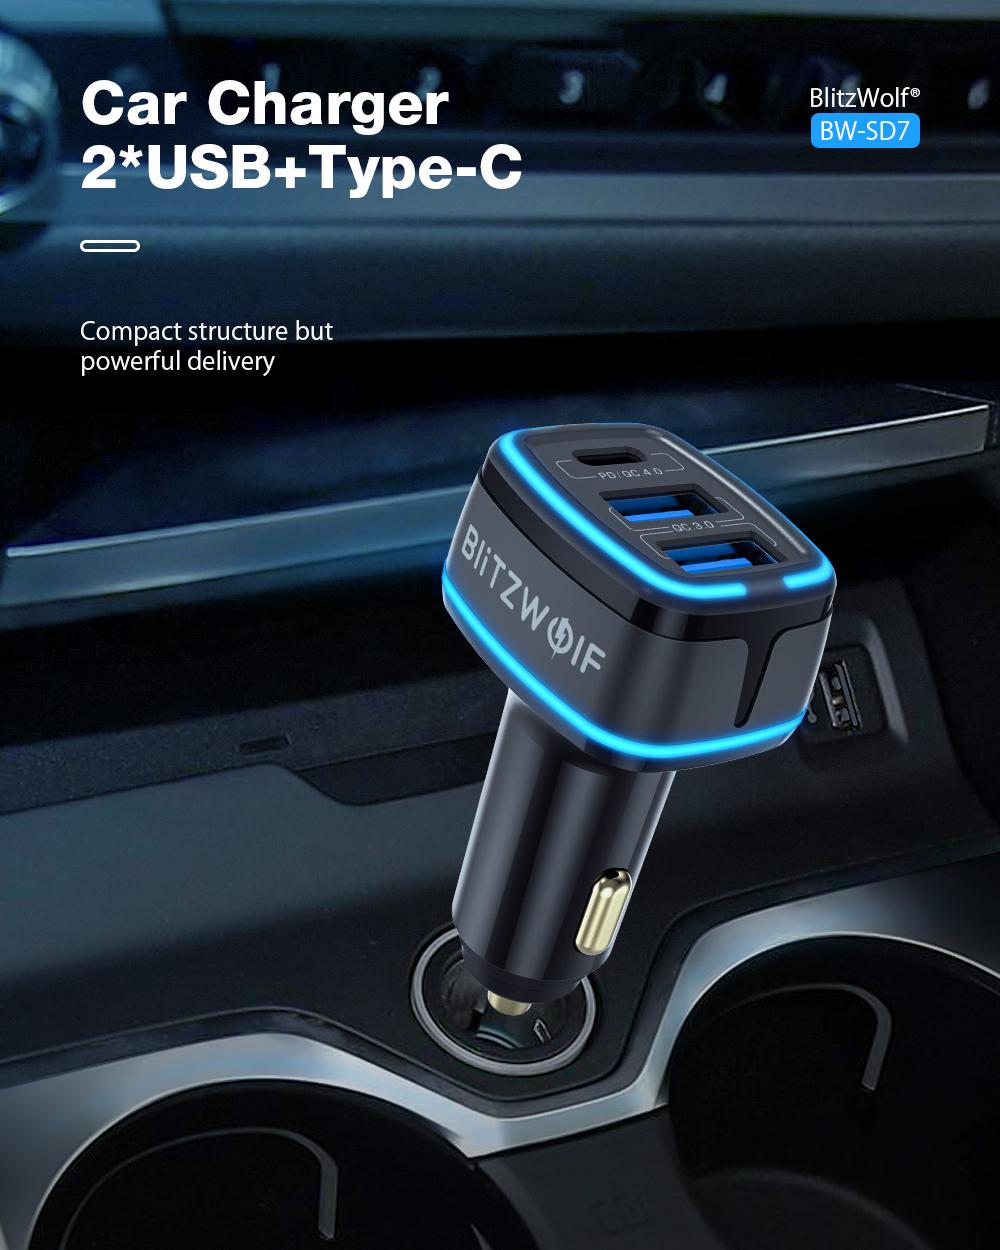 BlitzWolf BW-SD7 car charger